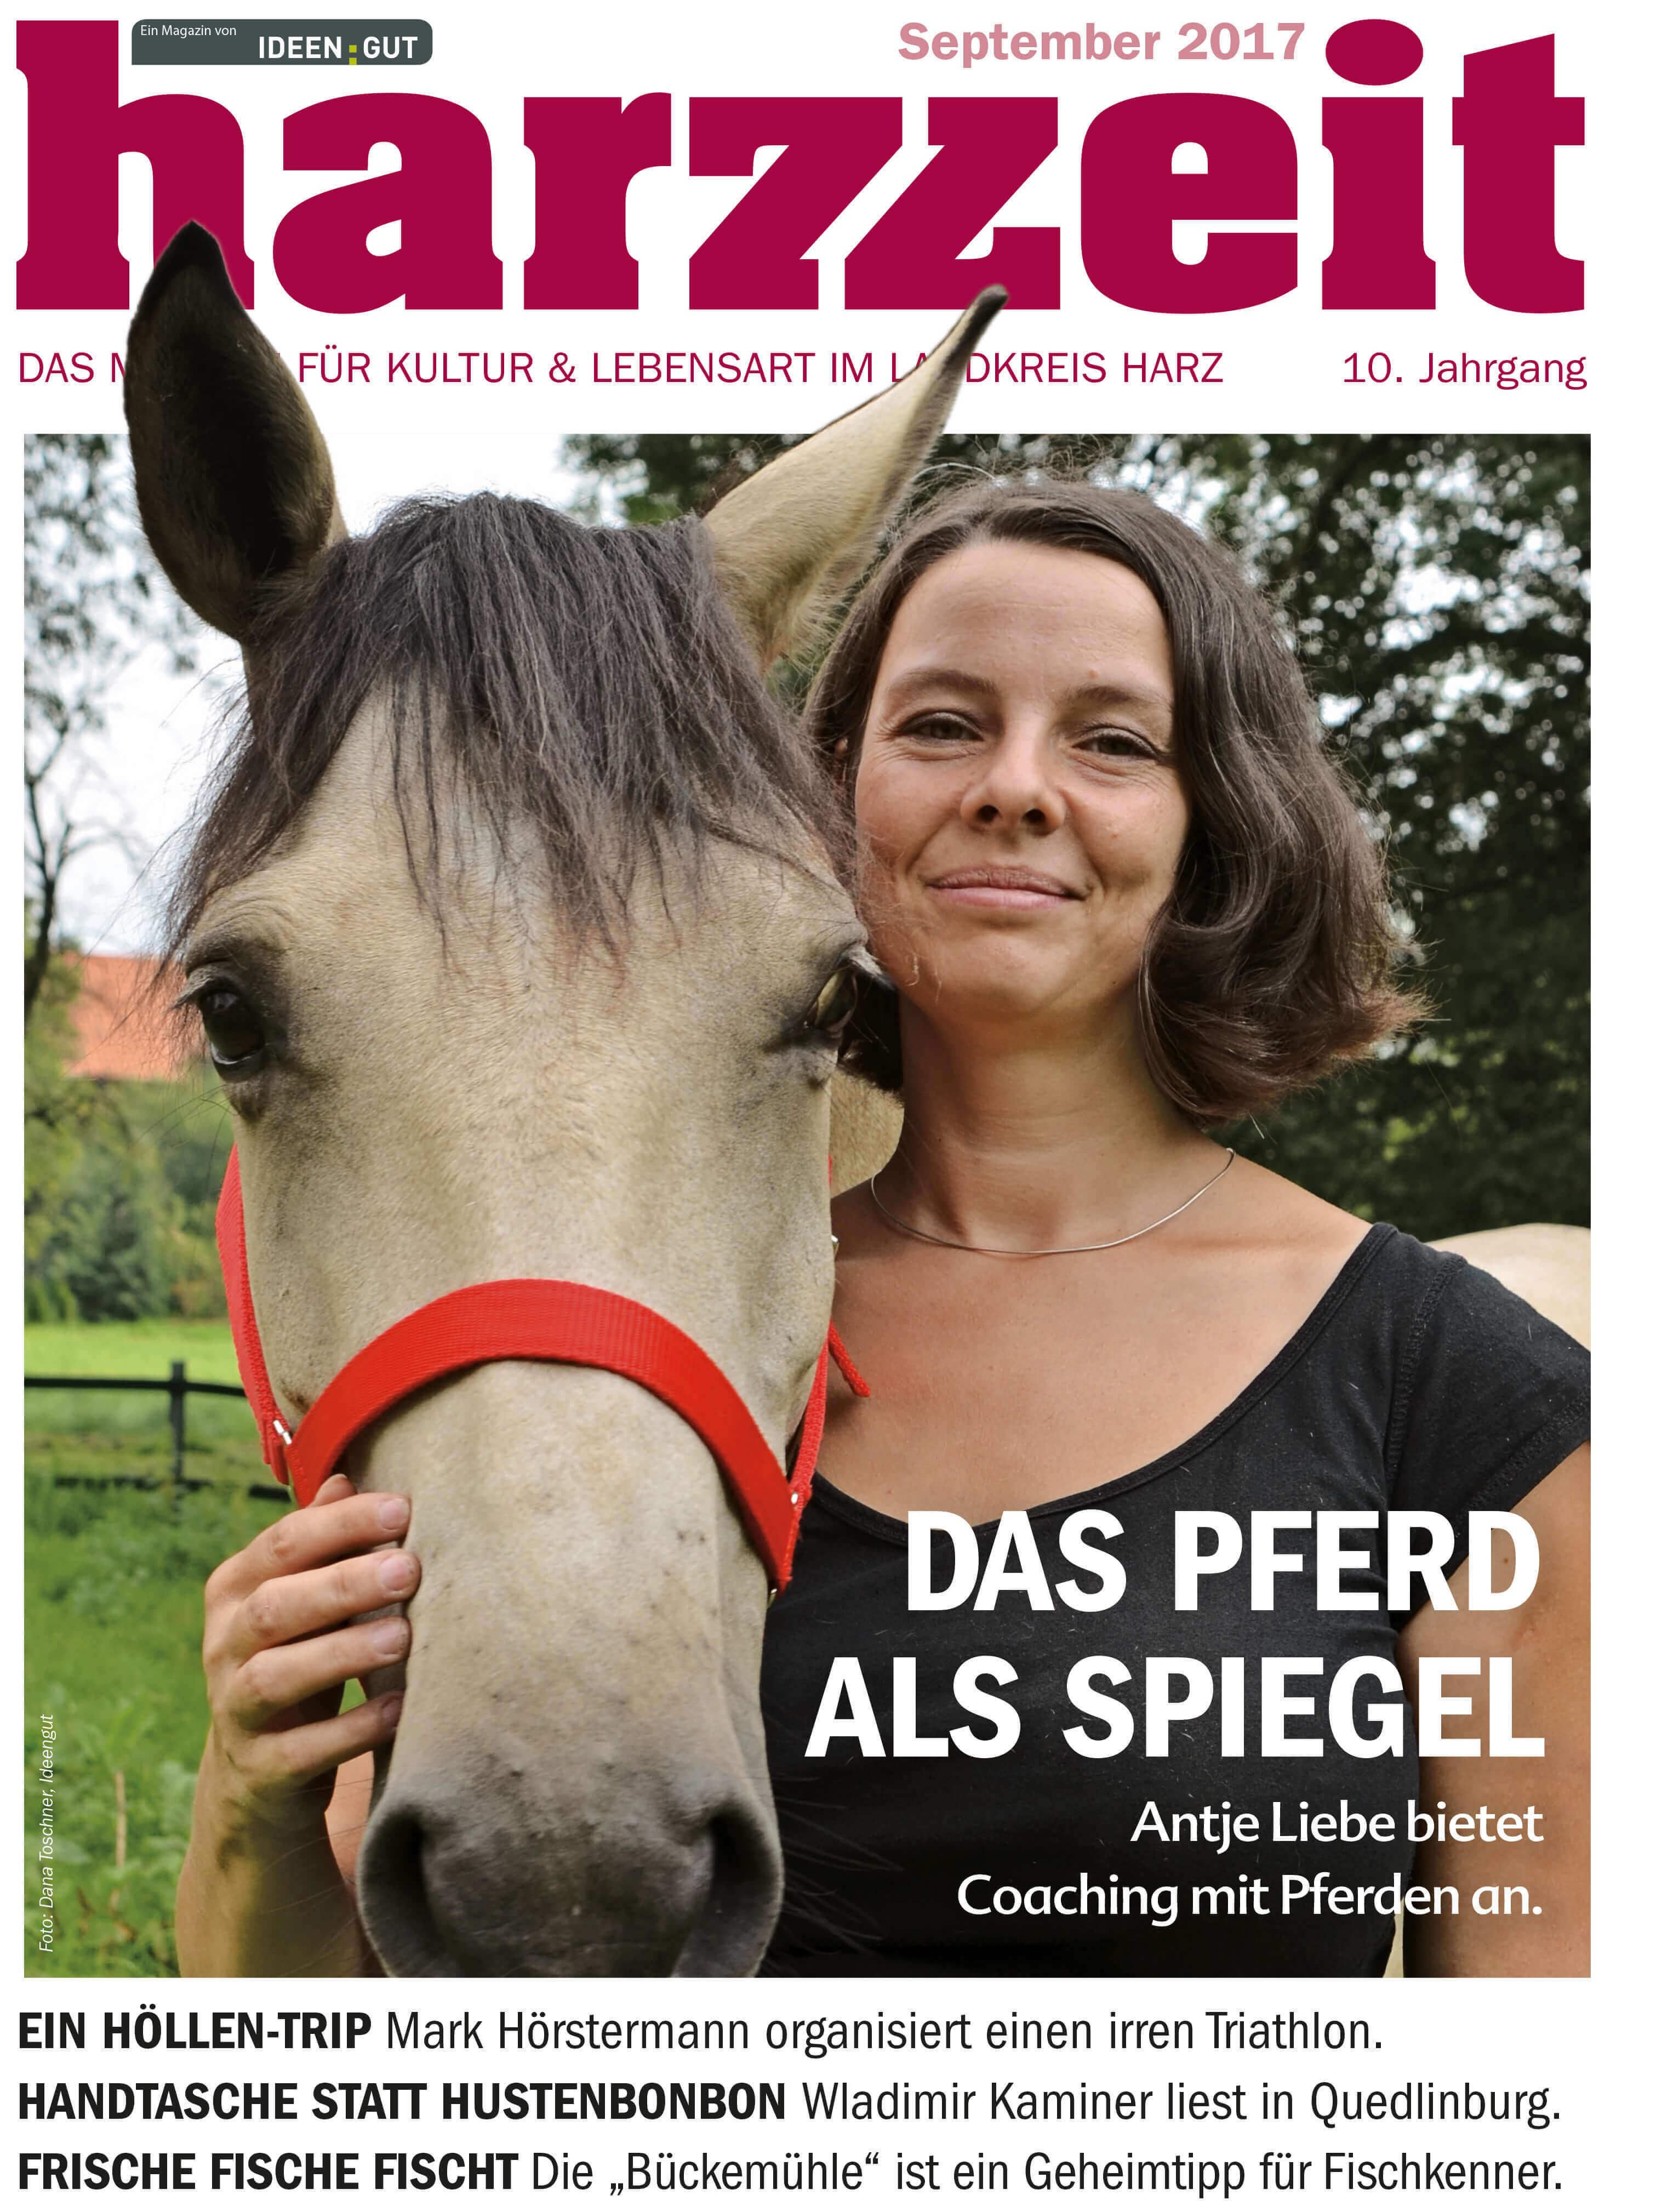 Harzzeit Cover 09/2017 | Coaching mit Pferden Harz